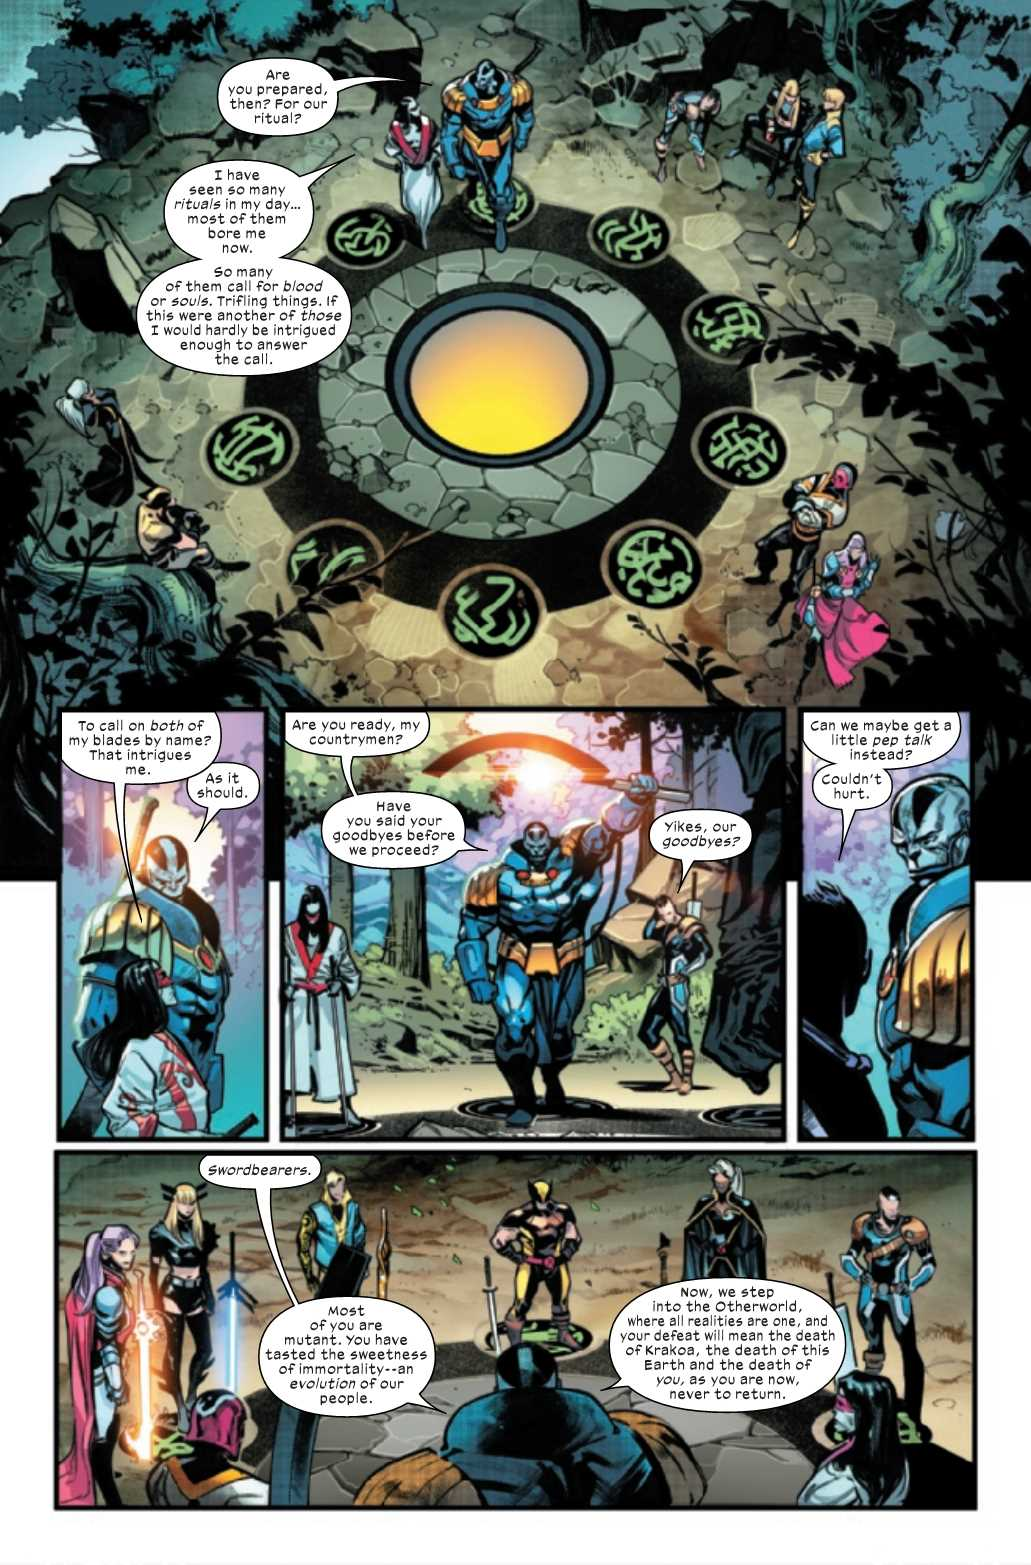 Marvel X OF SWORDS STASIS #1